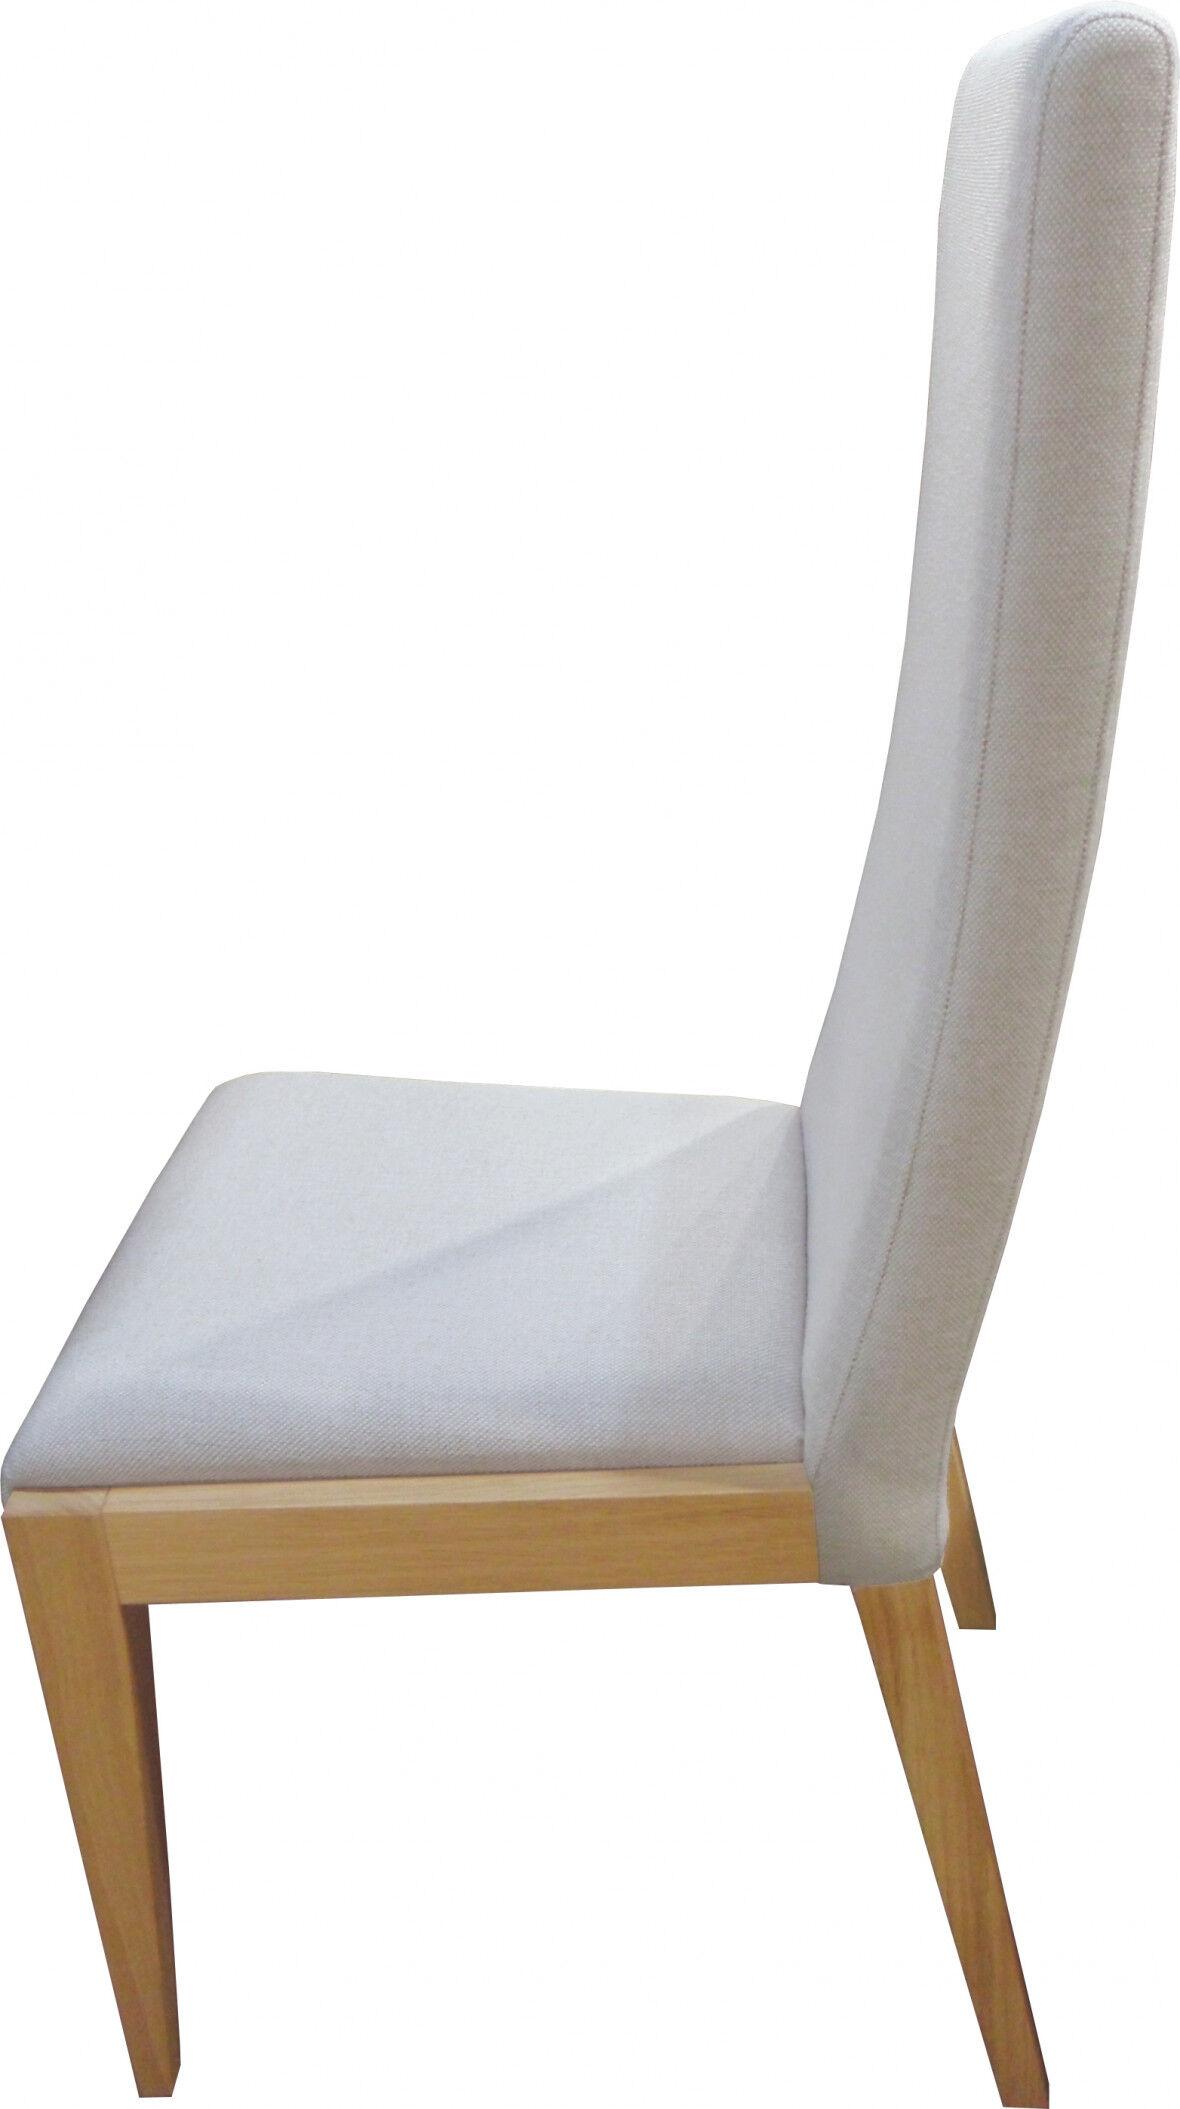 Chaise chêne massif clair tissu beige